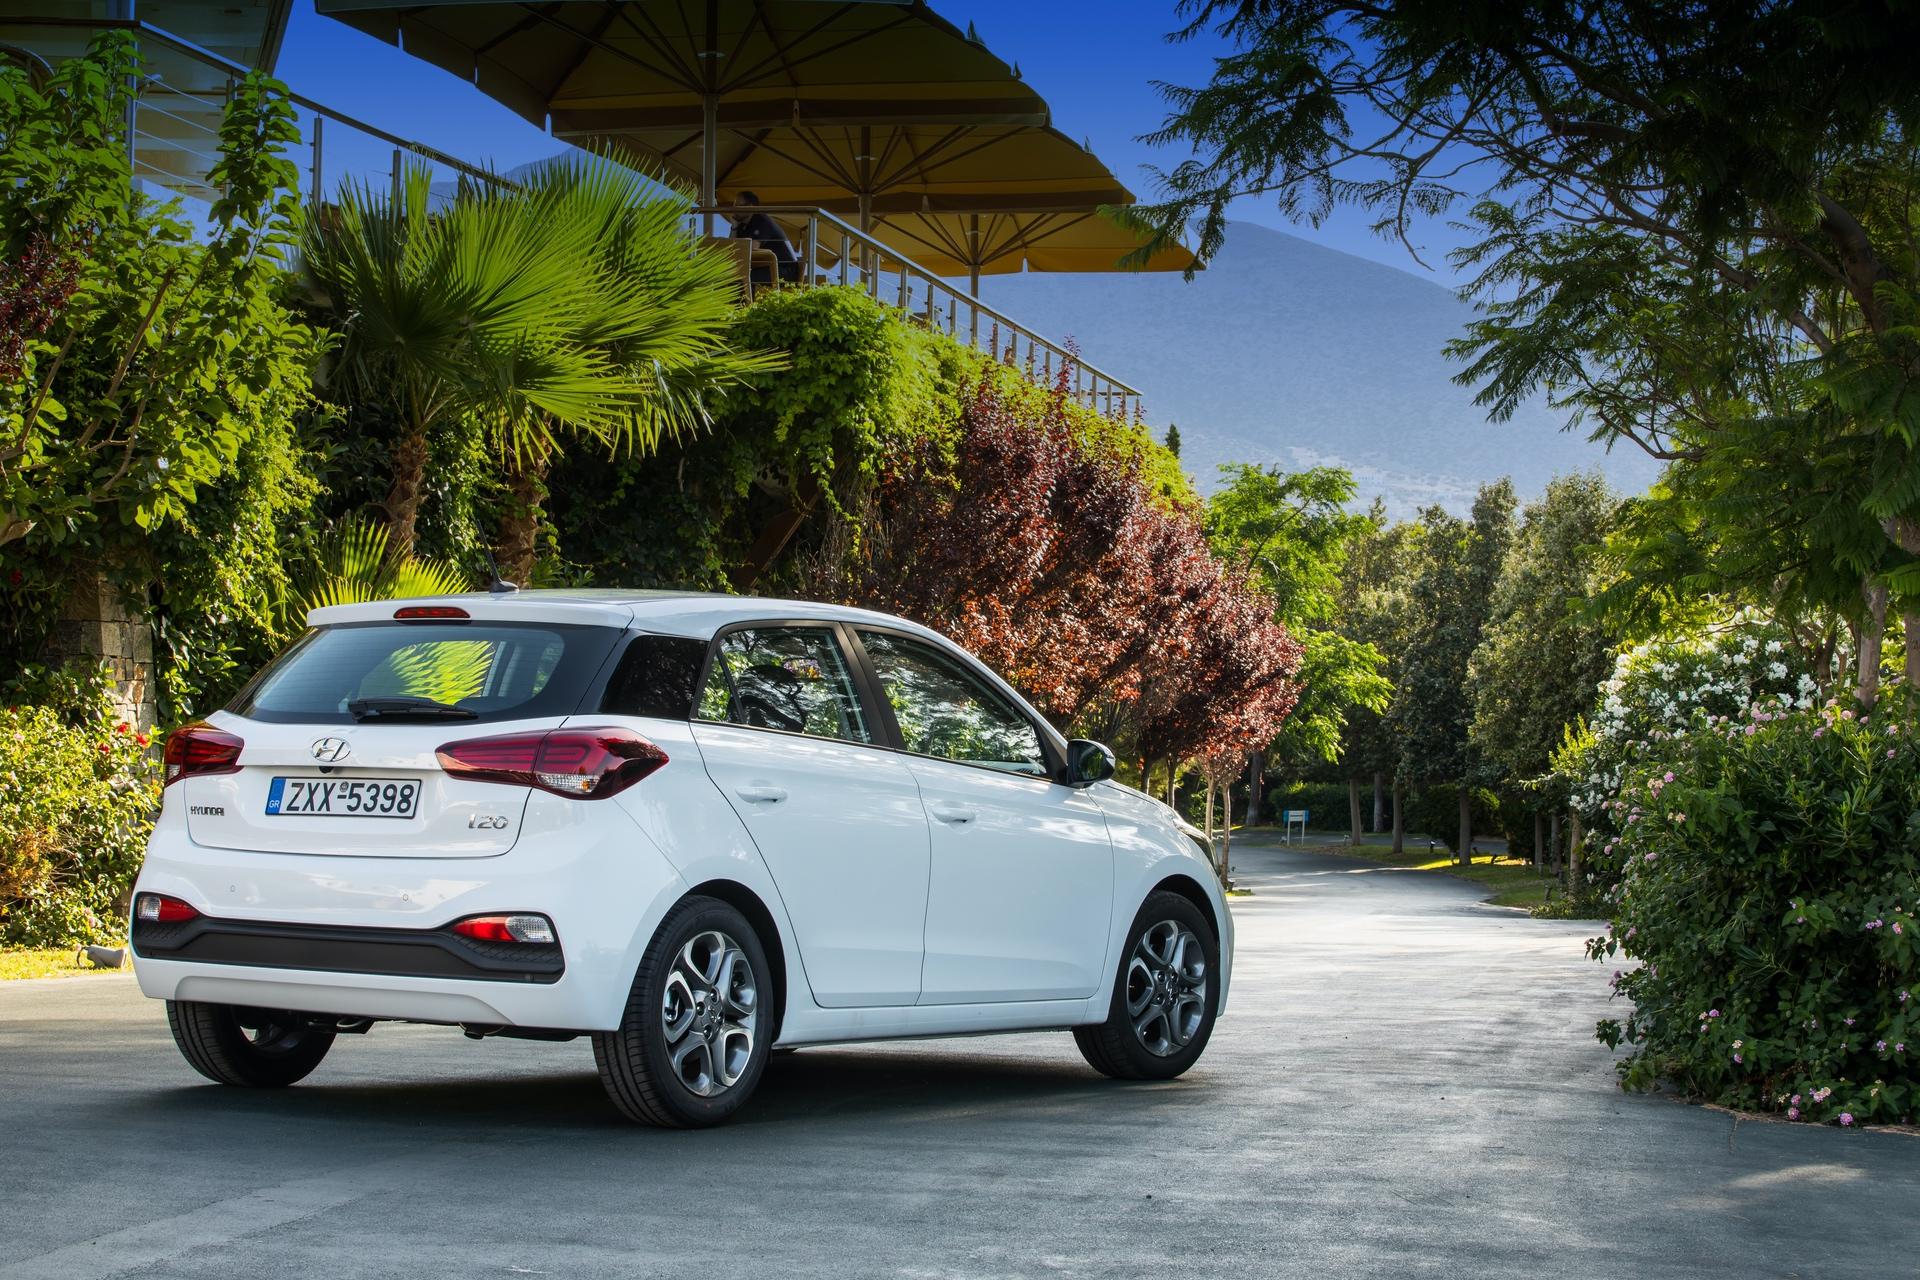 Hyundai_i20_facelift_greek_presskit_0004